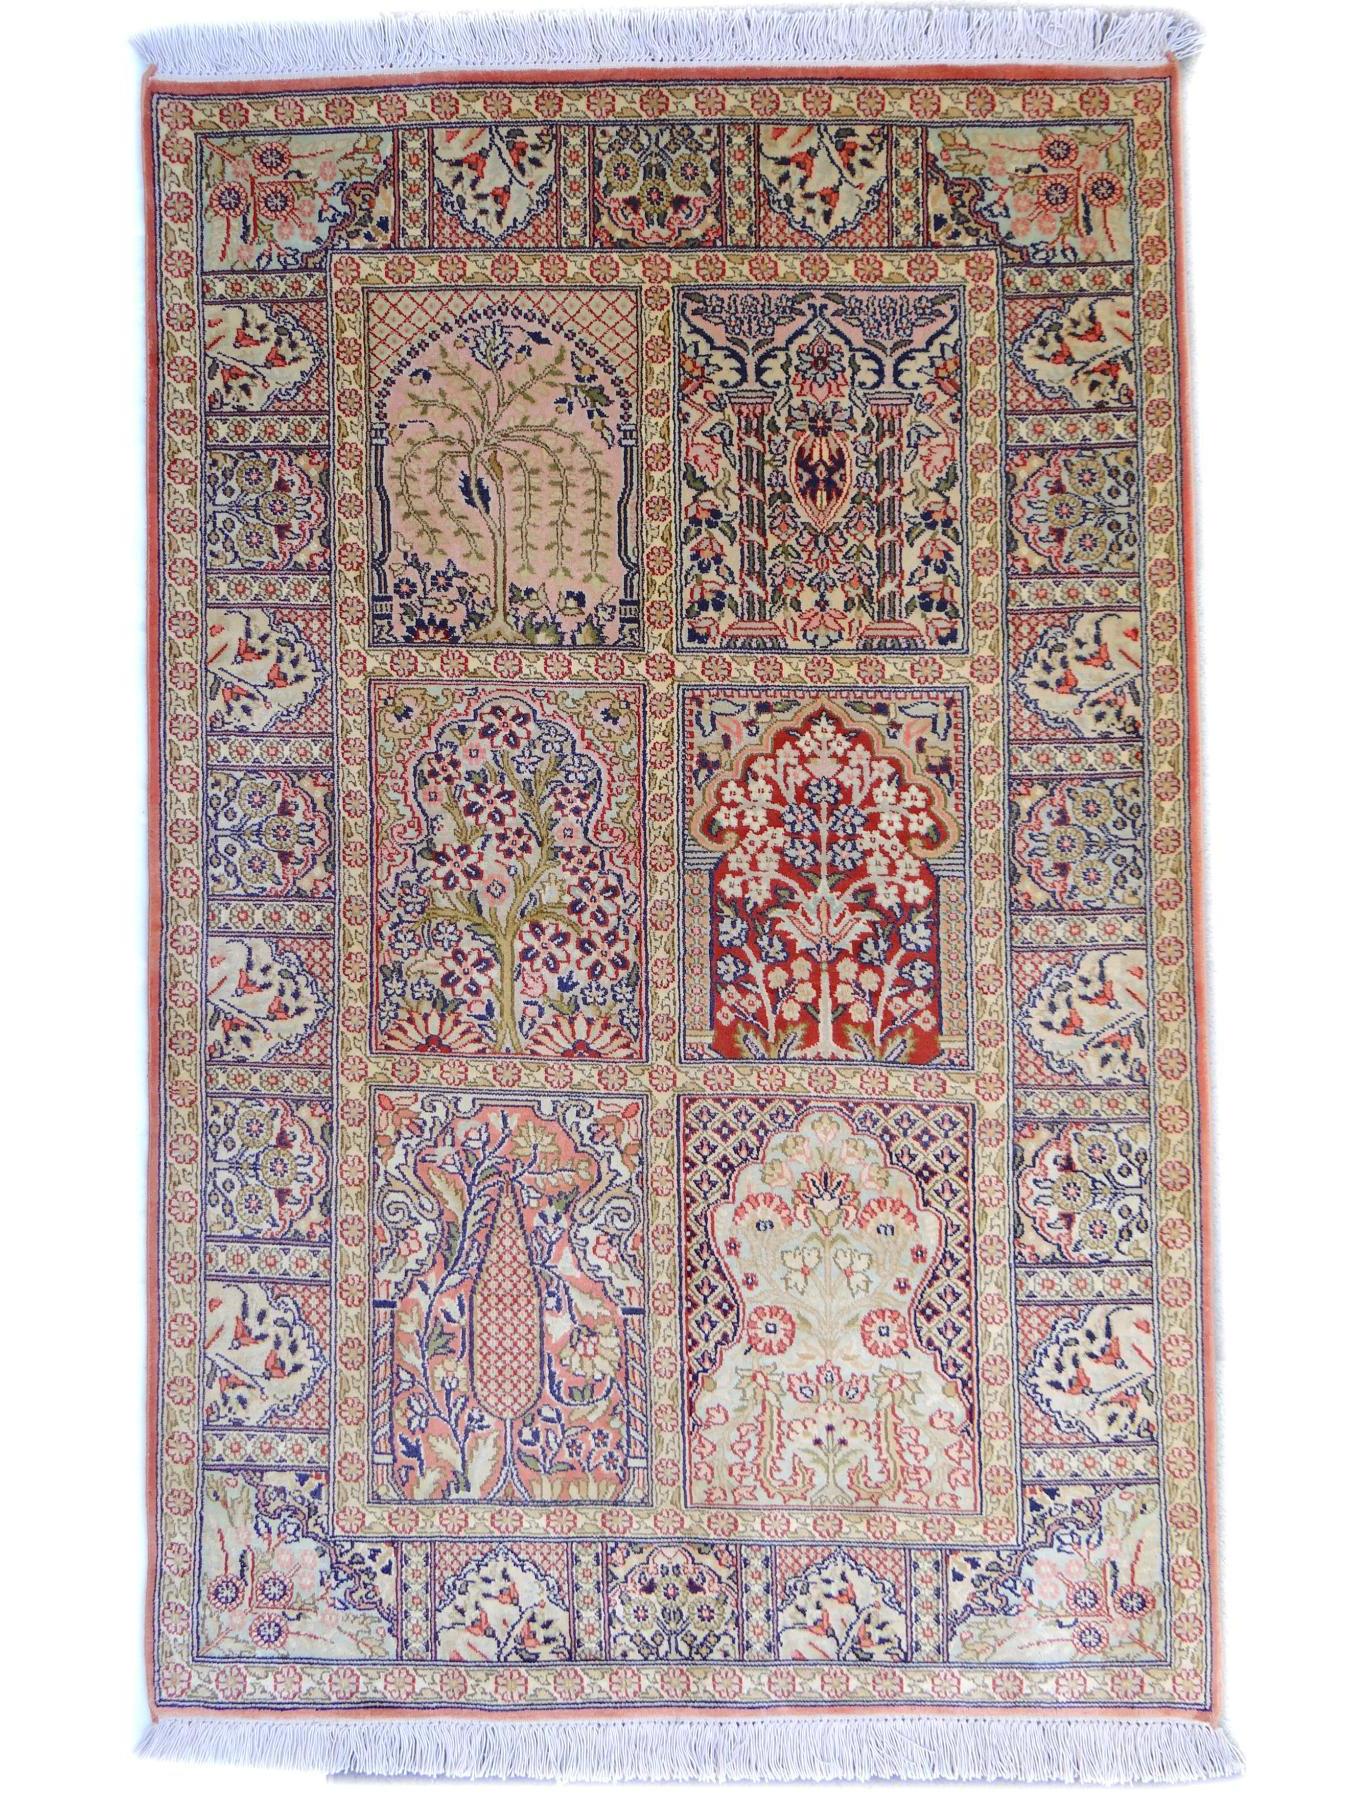 Srinagar Soie Fin Tapis Prestigieux N 26328 126x80cm